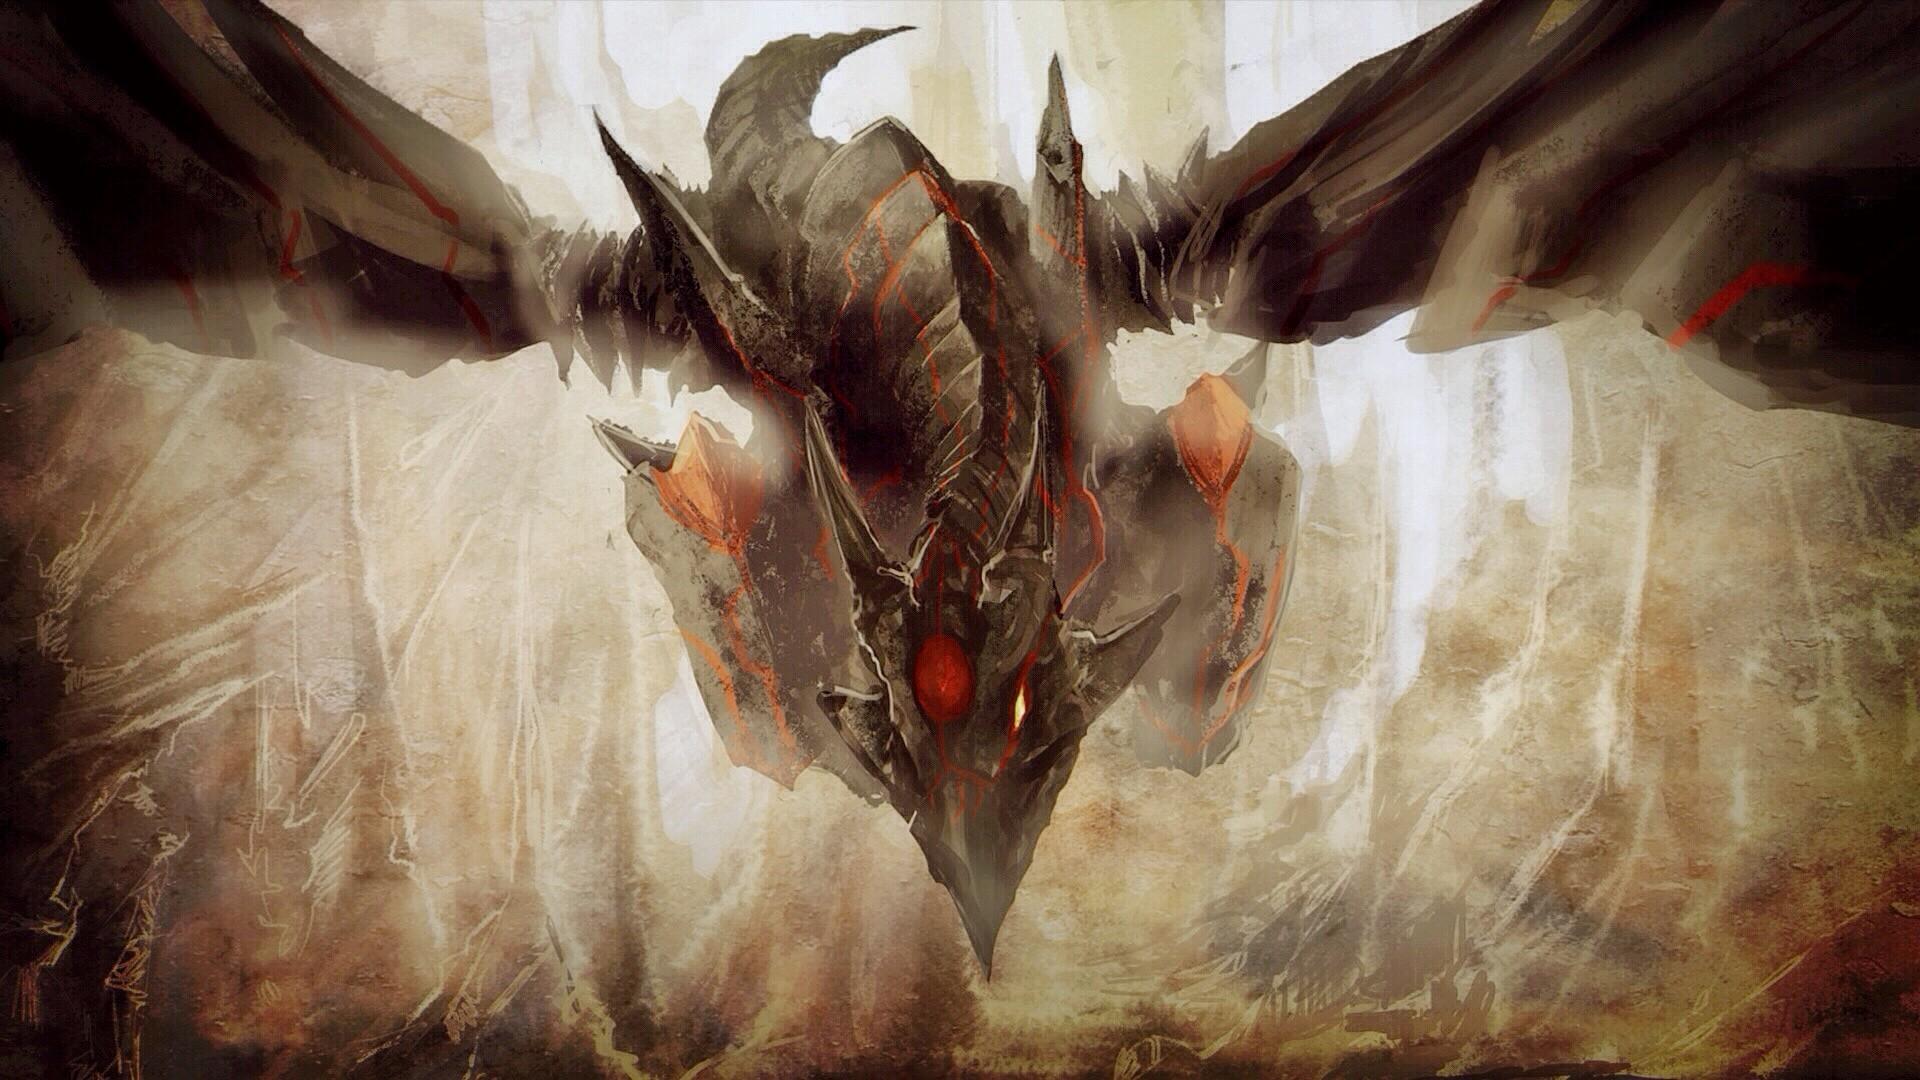 Wallpaper Painting Dragon Cave Mythology Trading Card Games